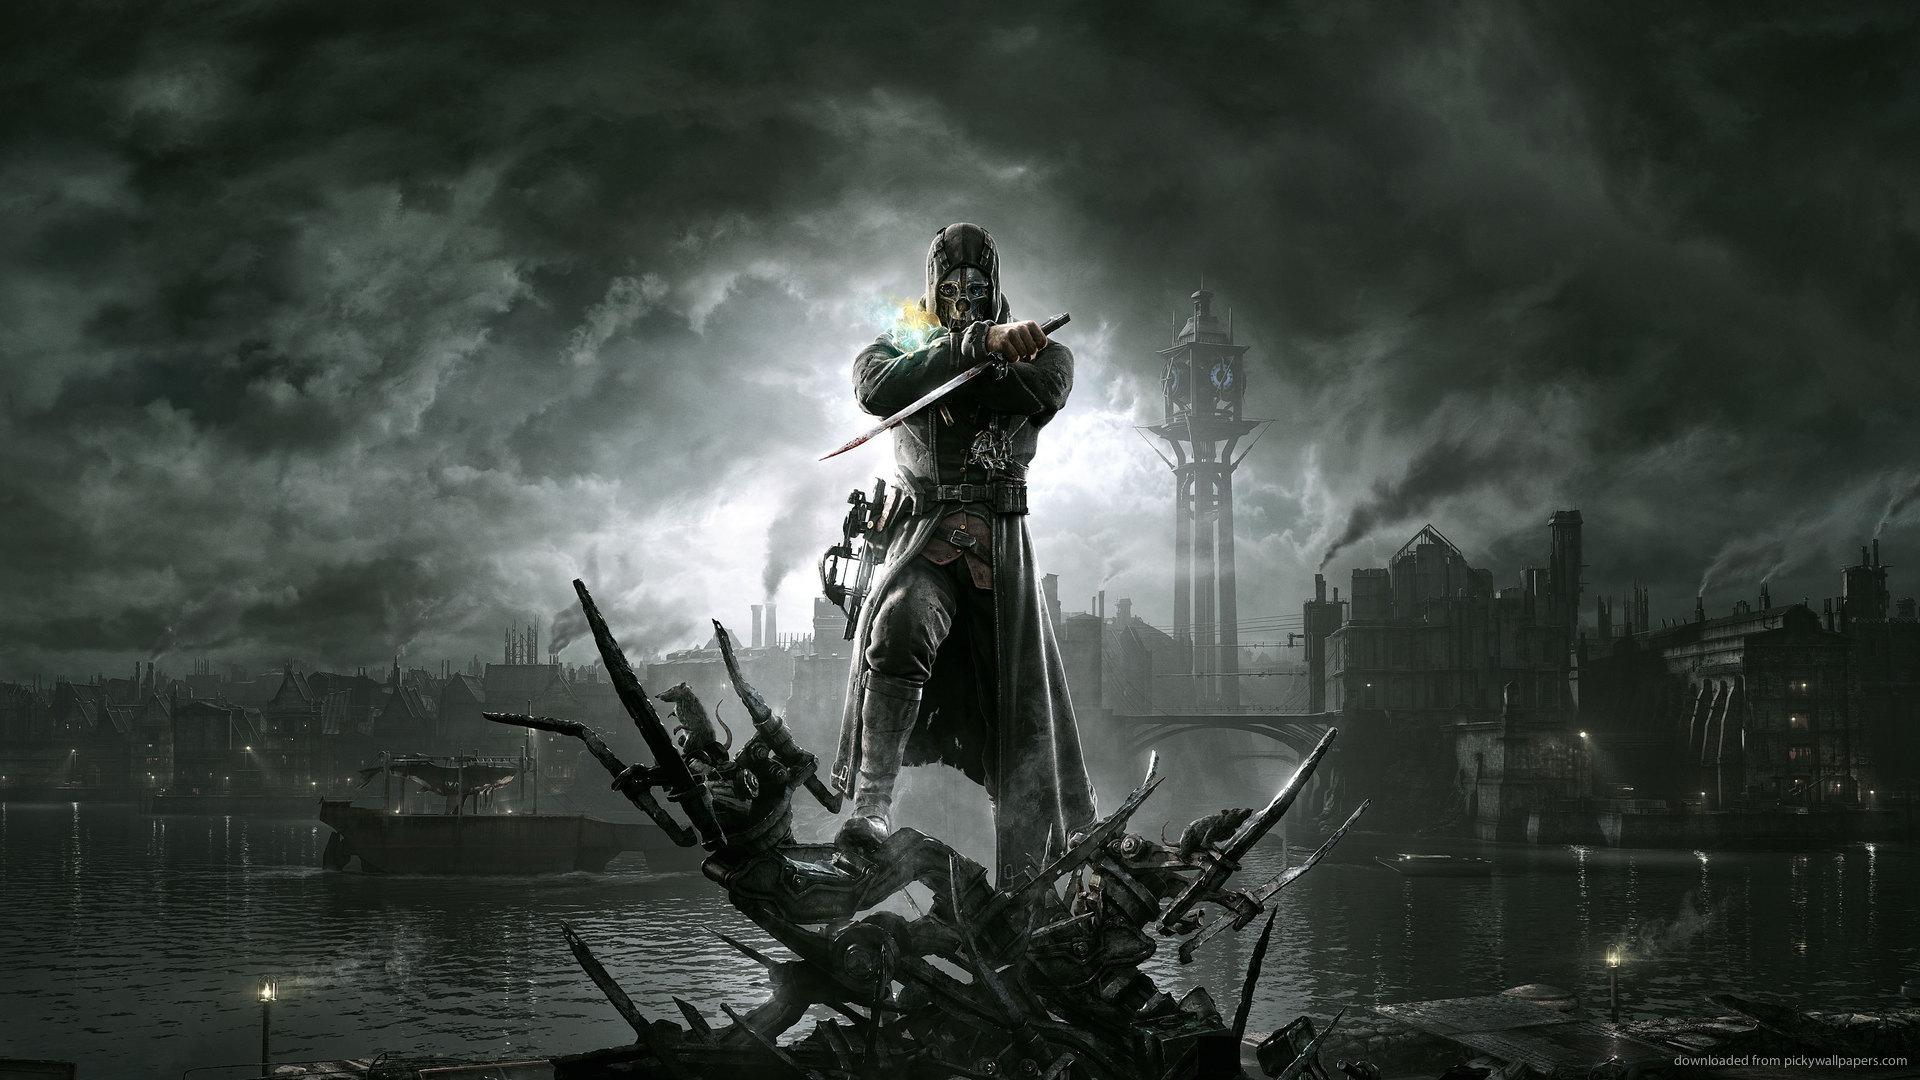 dishonored art id 80111